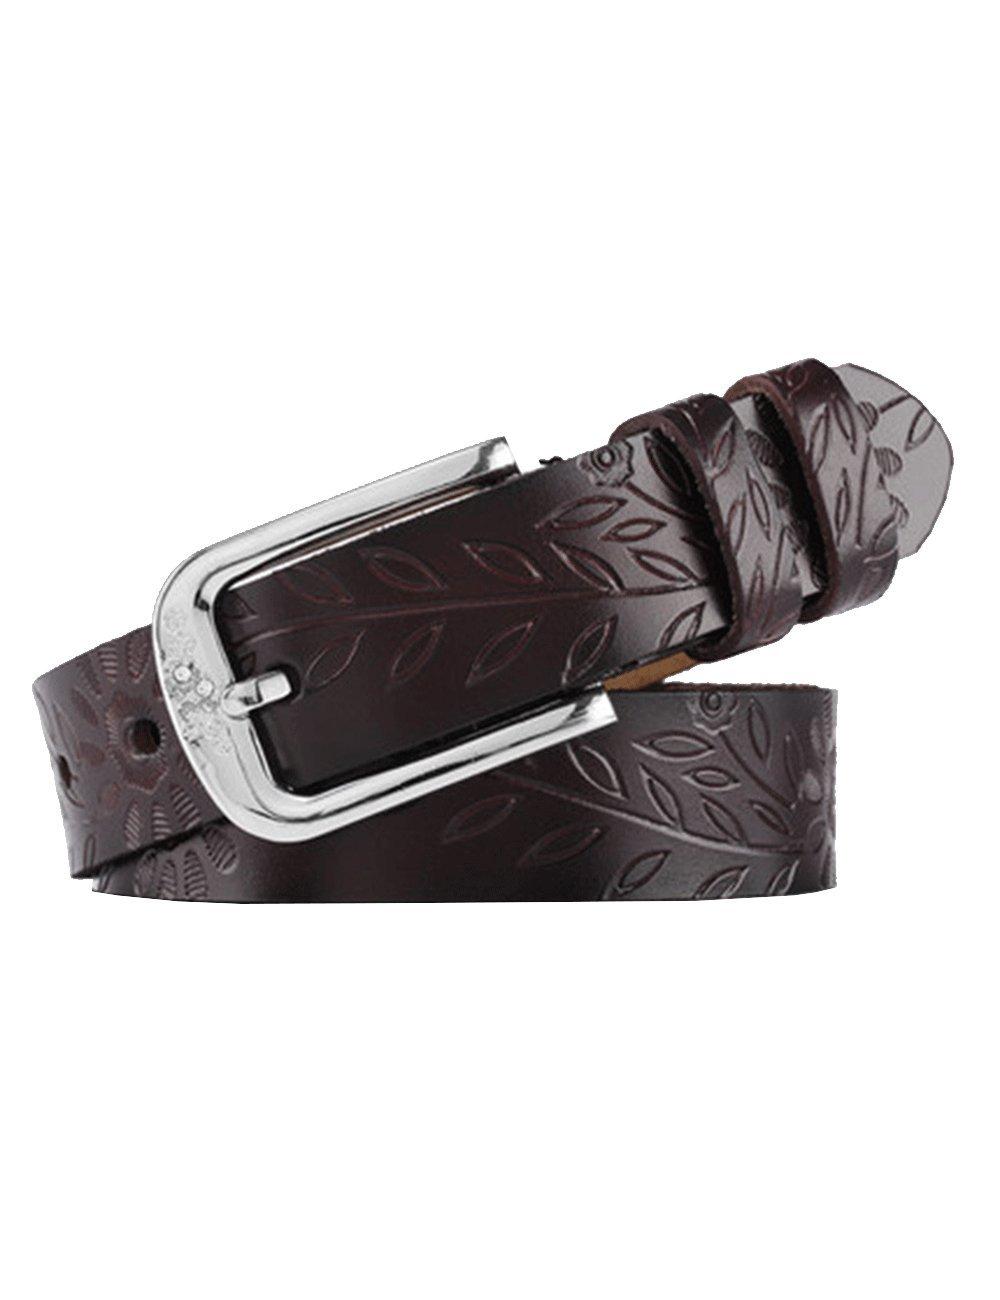 Chicwe Women's Plus Size Embossing Antique Genuine Leather Waist Belt Alloy Buckle Black 135 C17B007B01